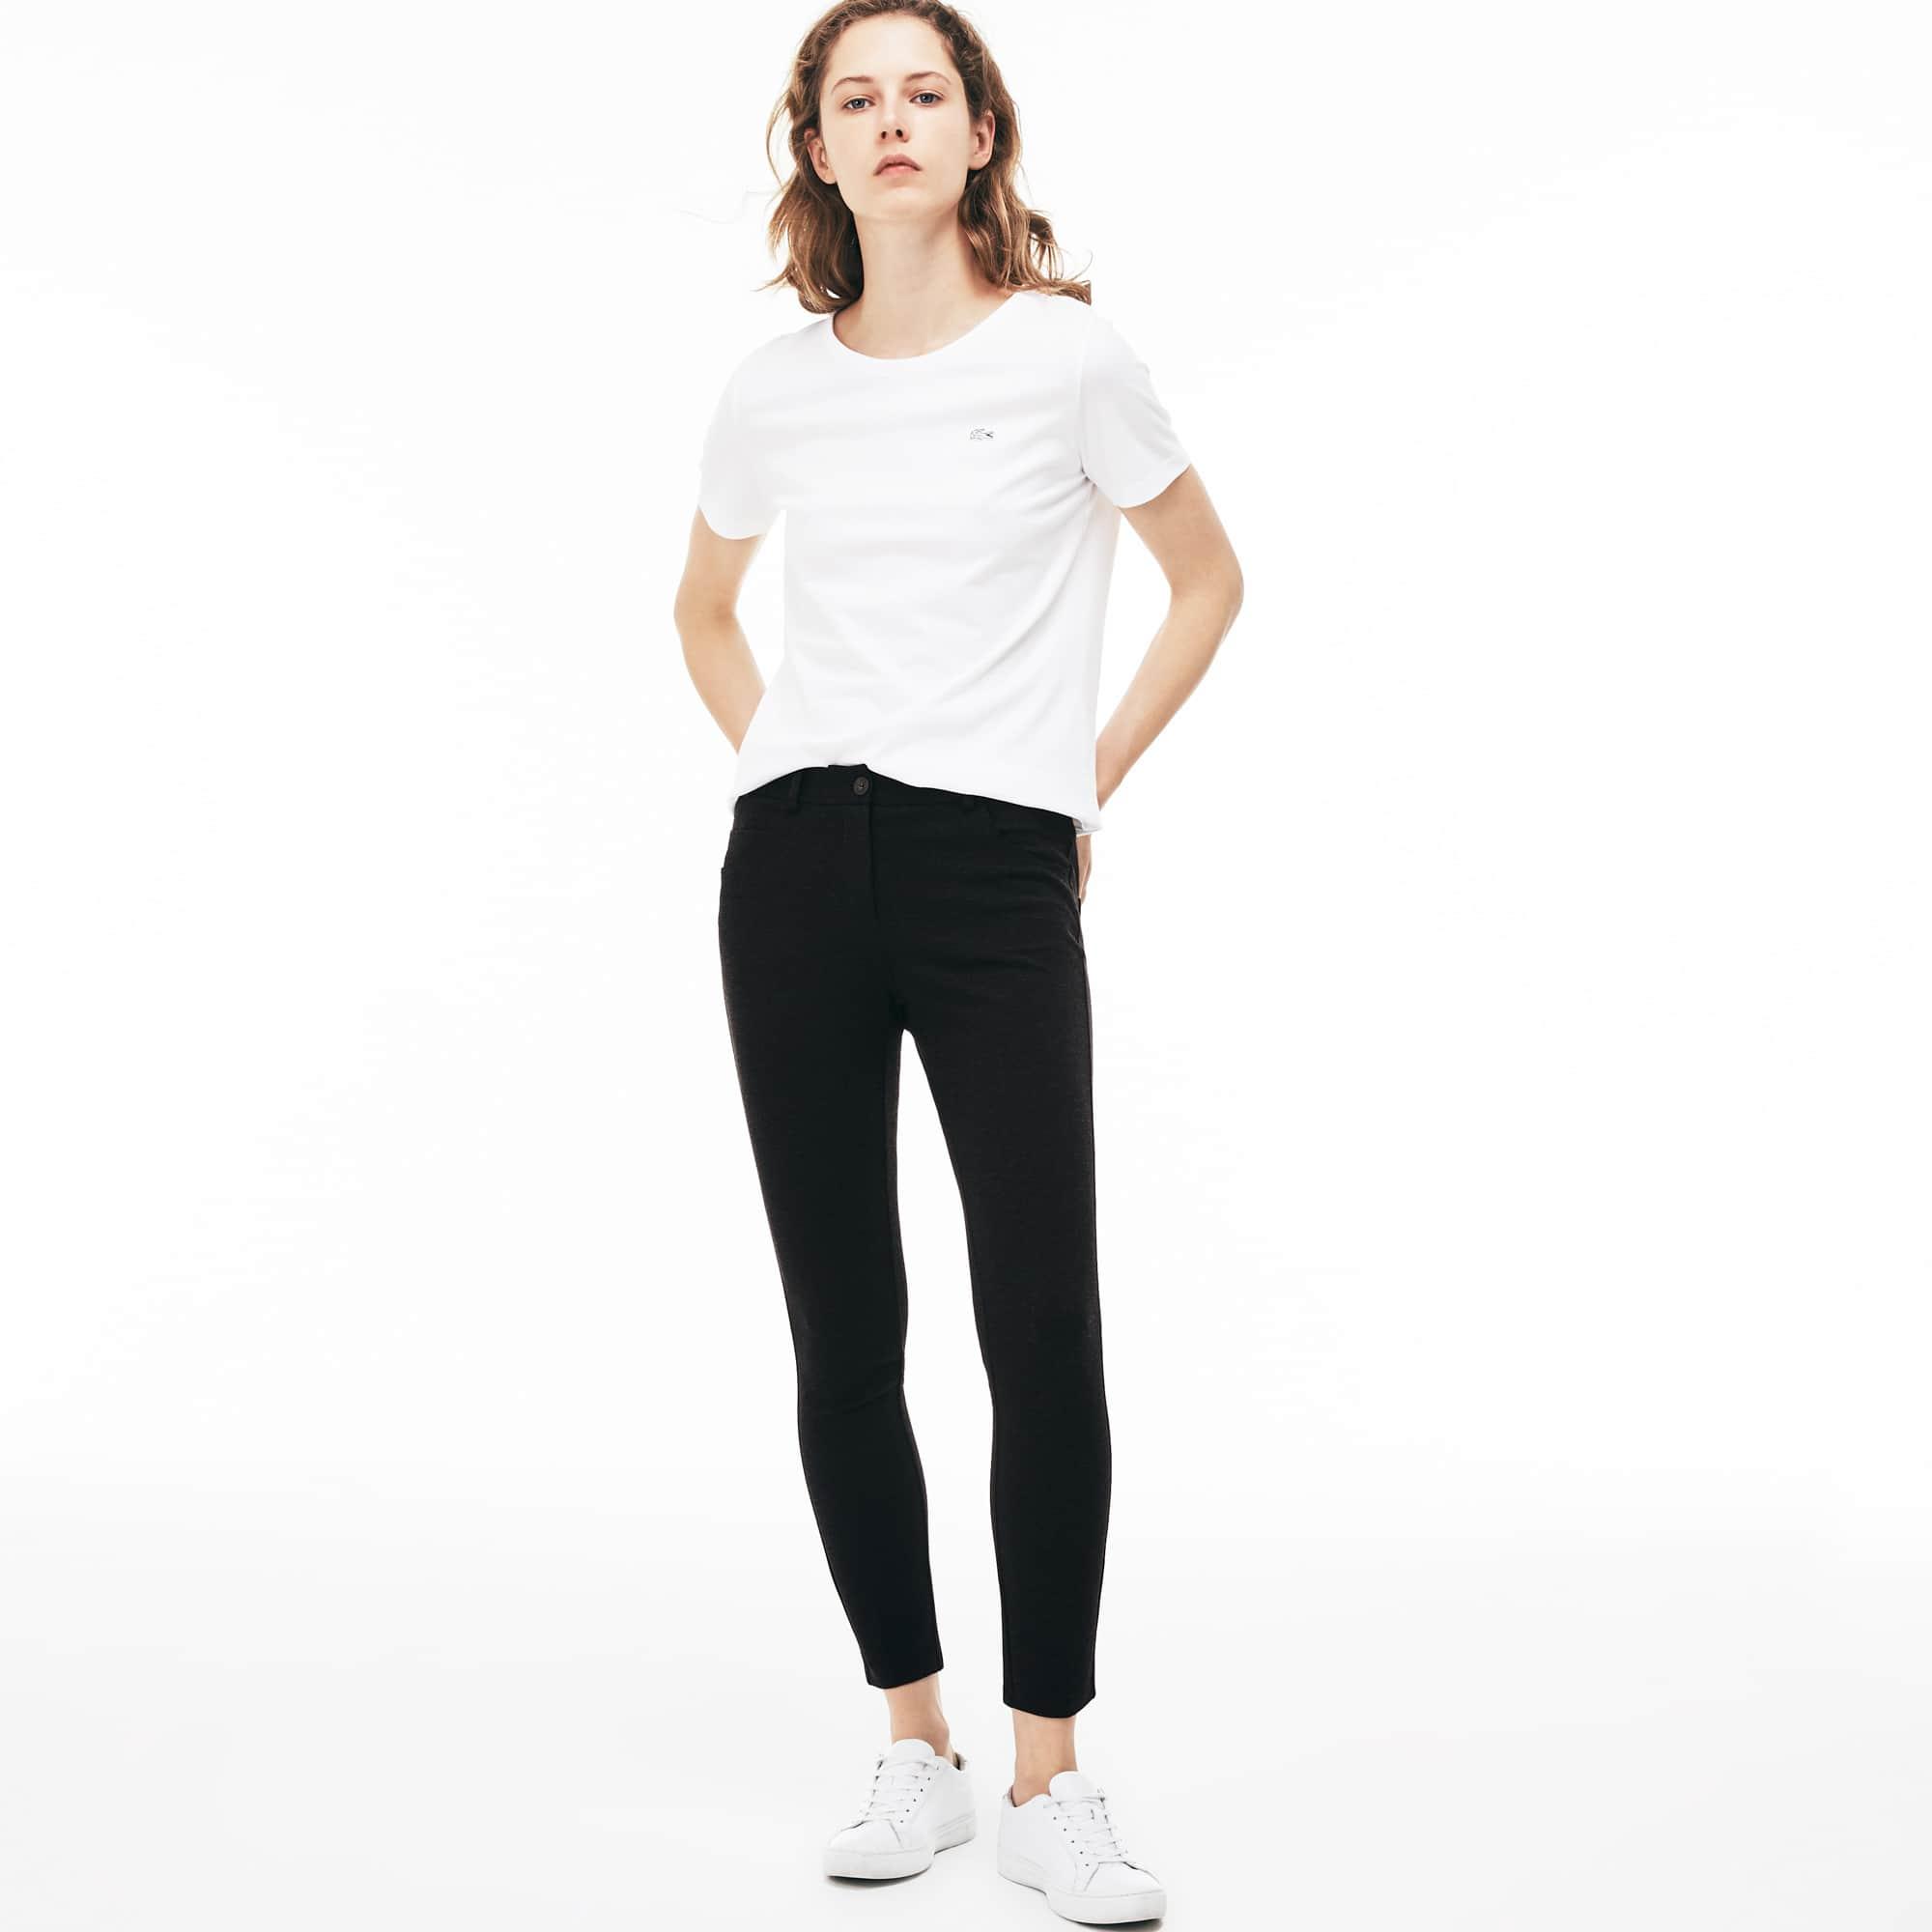 Pantalón Mujer Milano Stretch